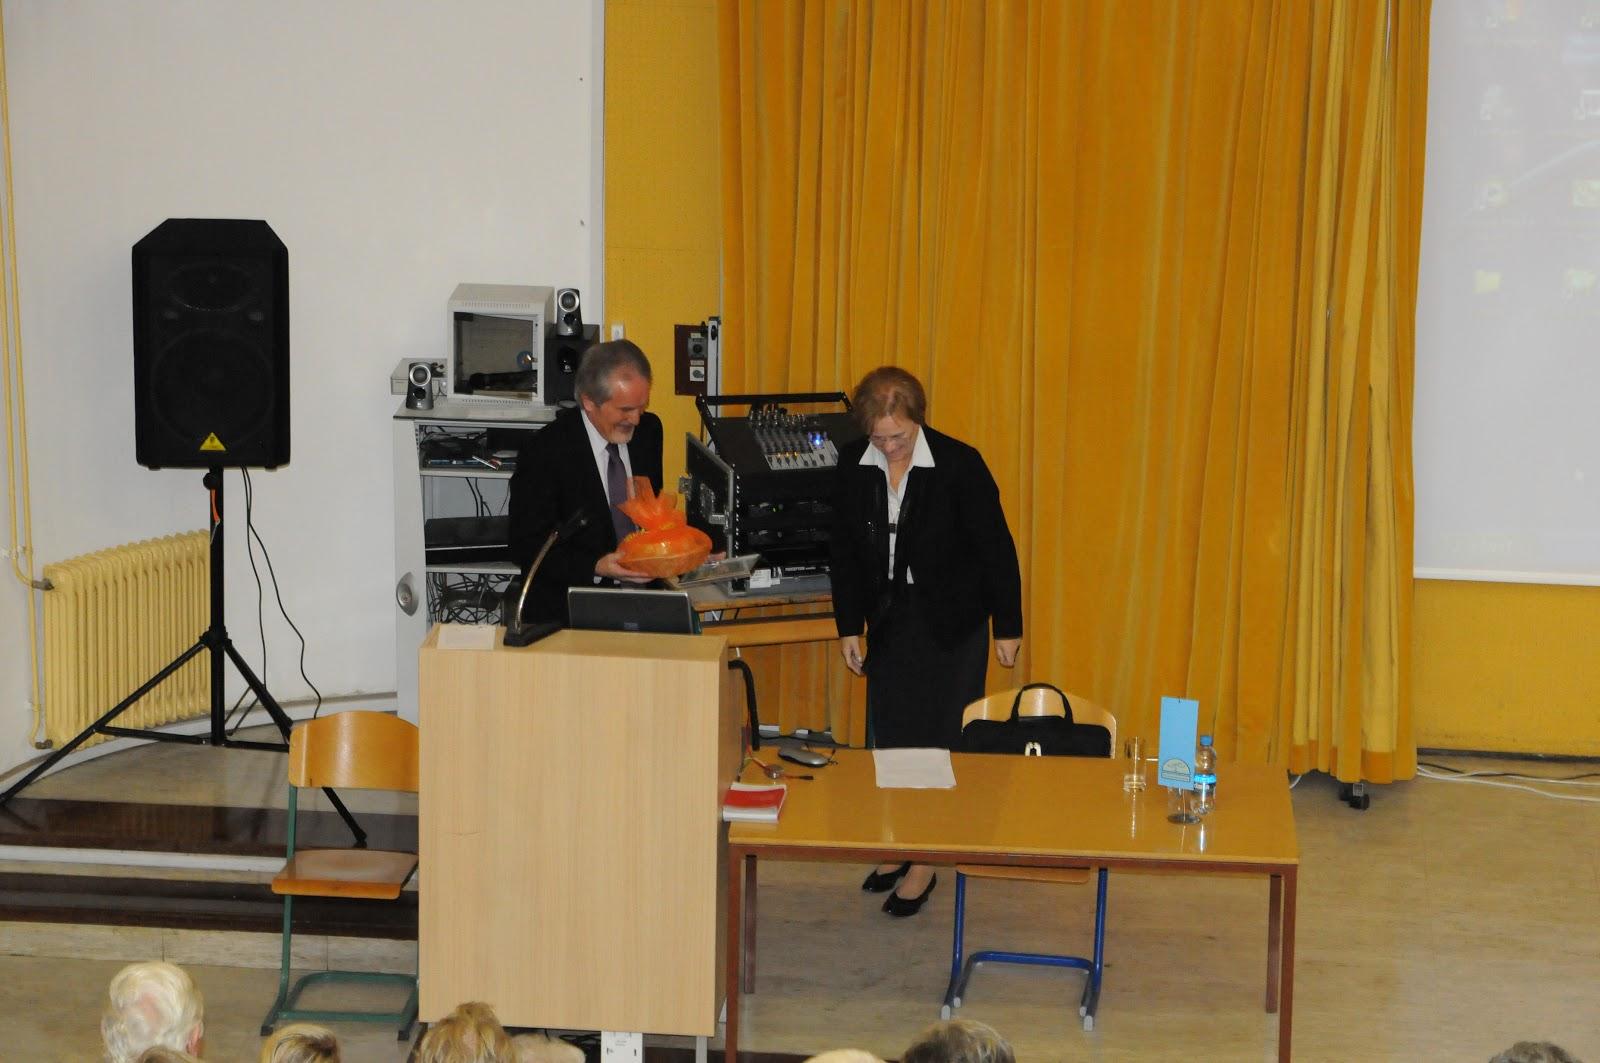 Predavanje, dr. Camlek - oktober 2011 - DSC_3890.JPG